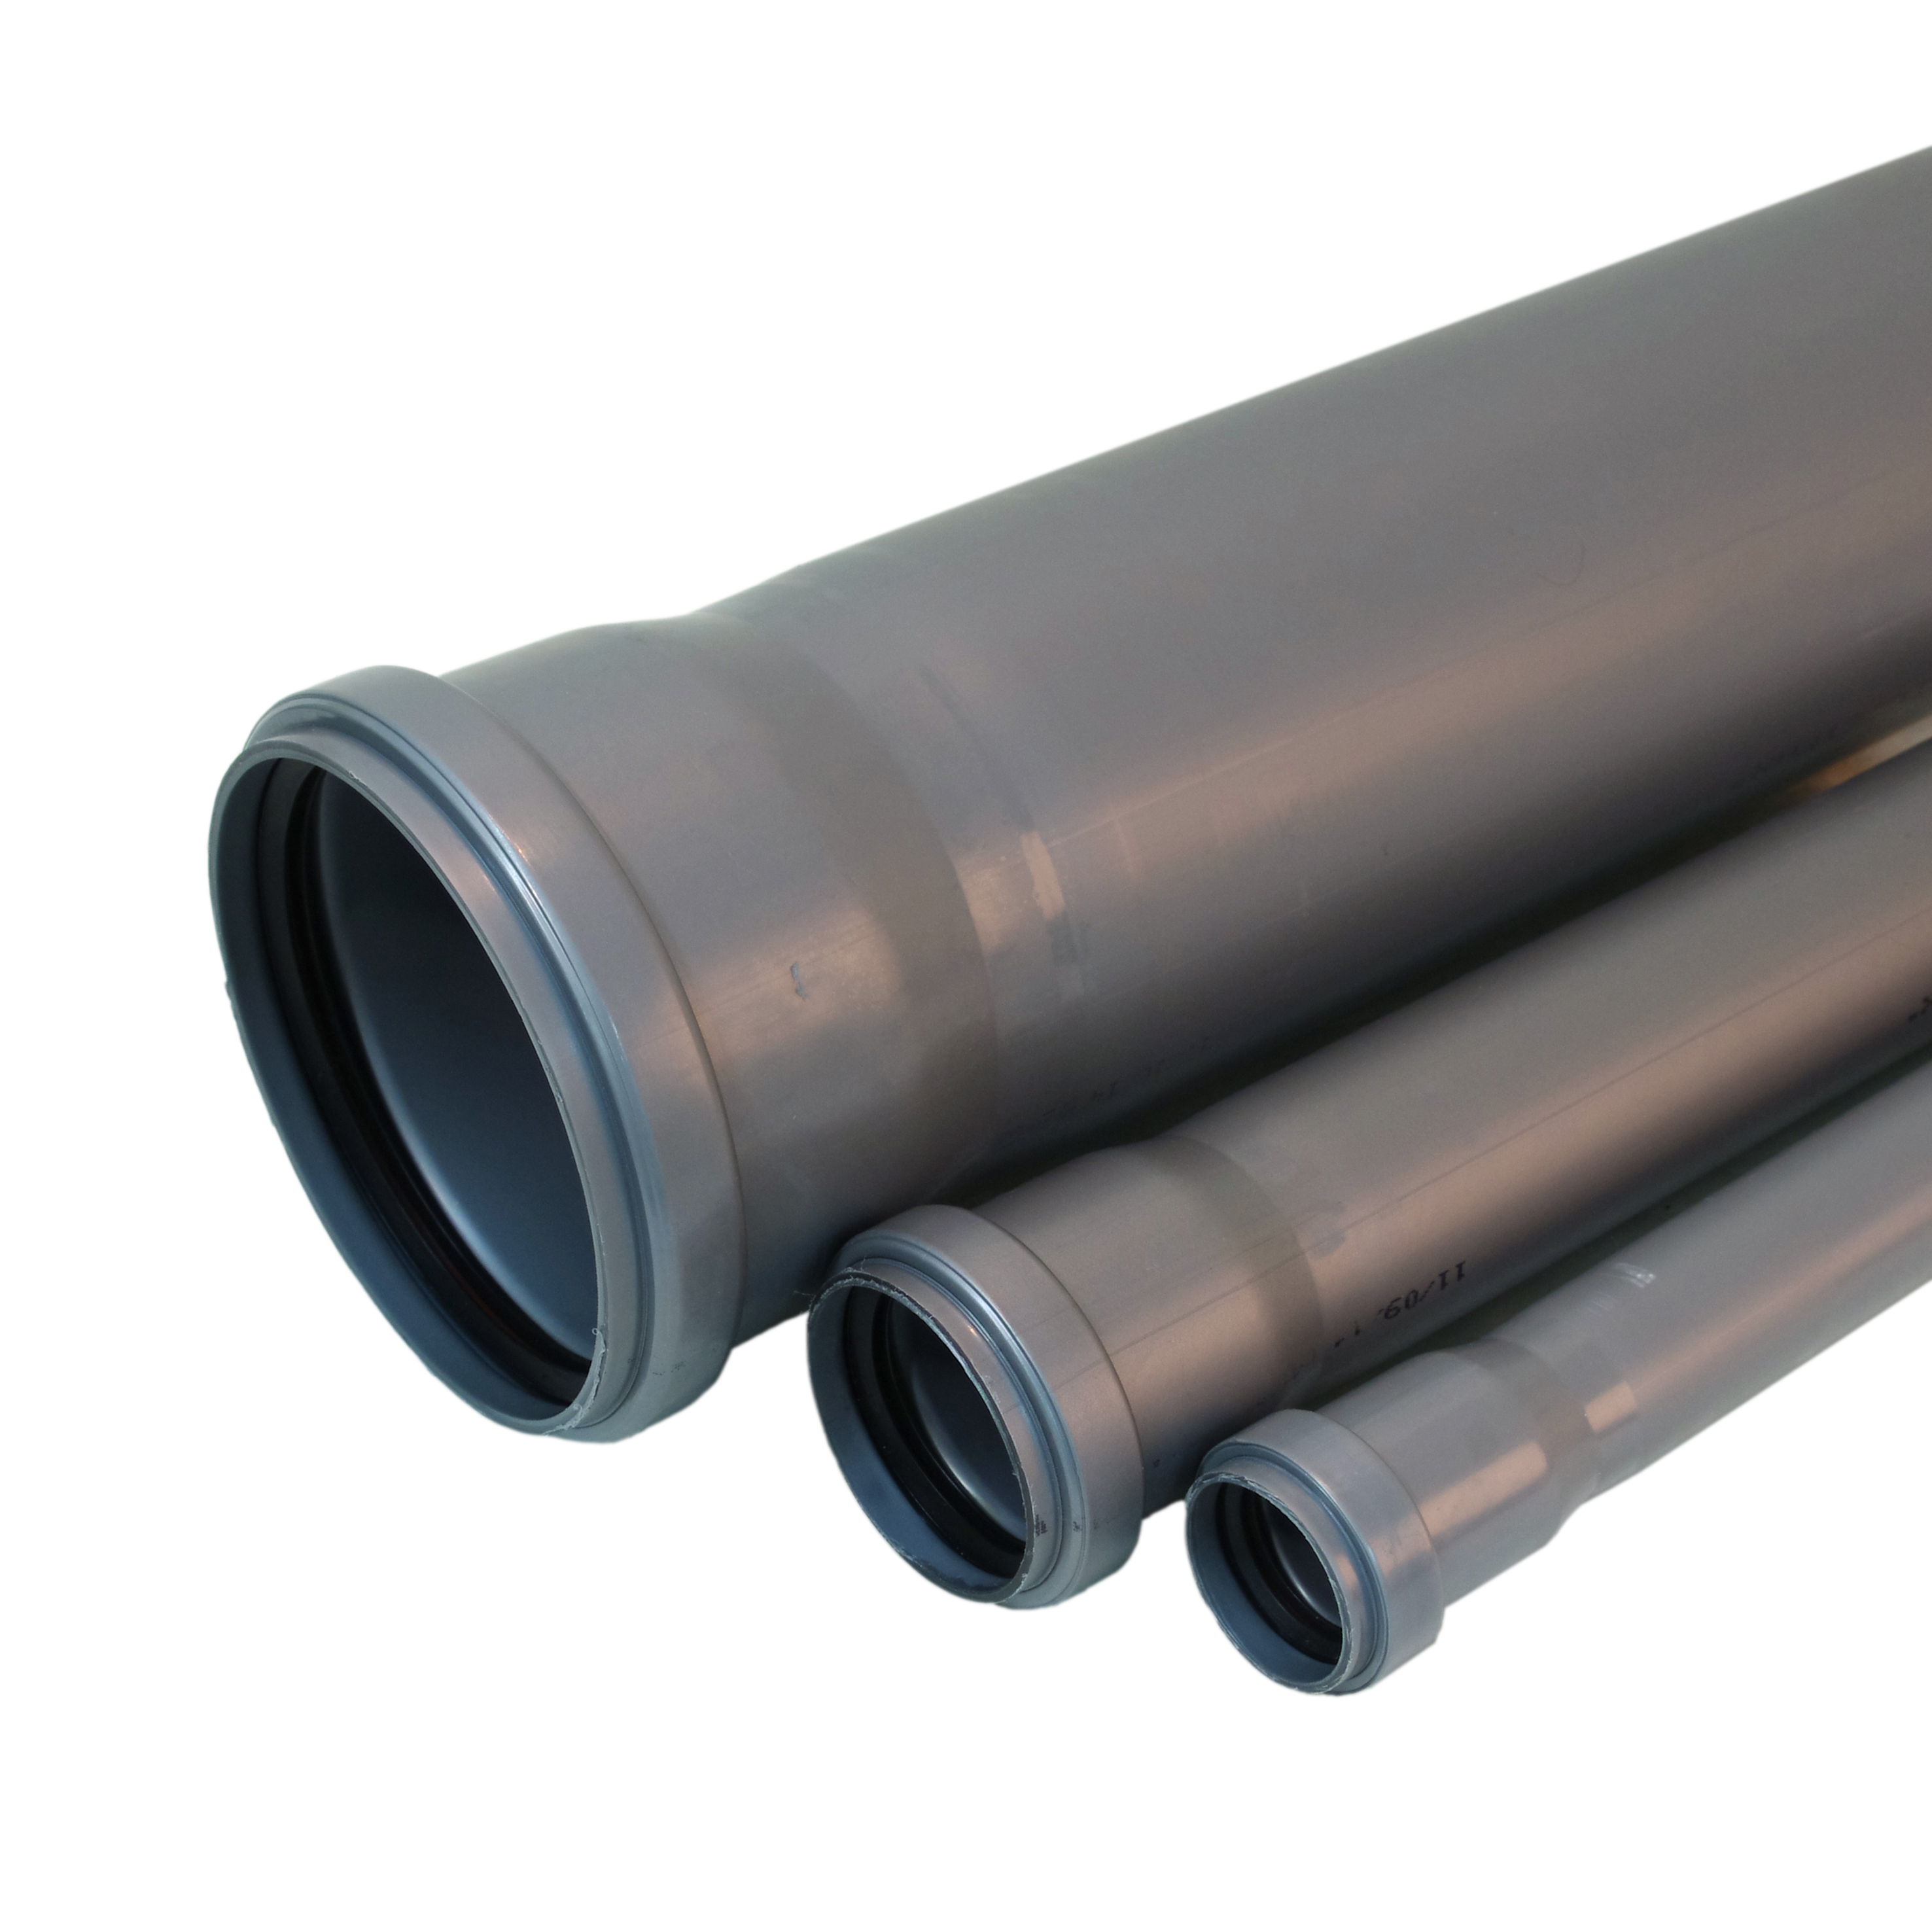 теплица из канализационных труб 50 мм